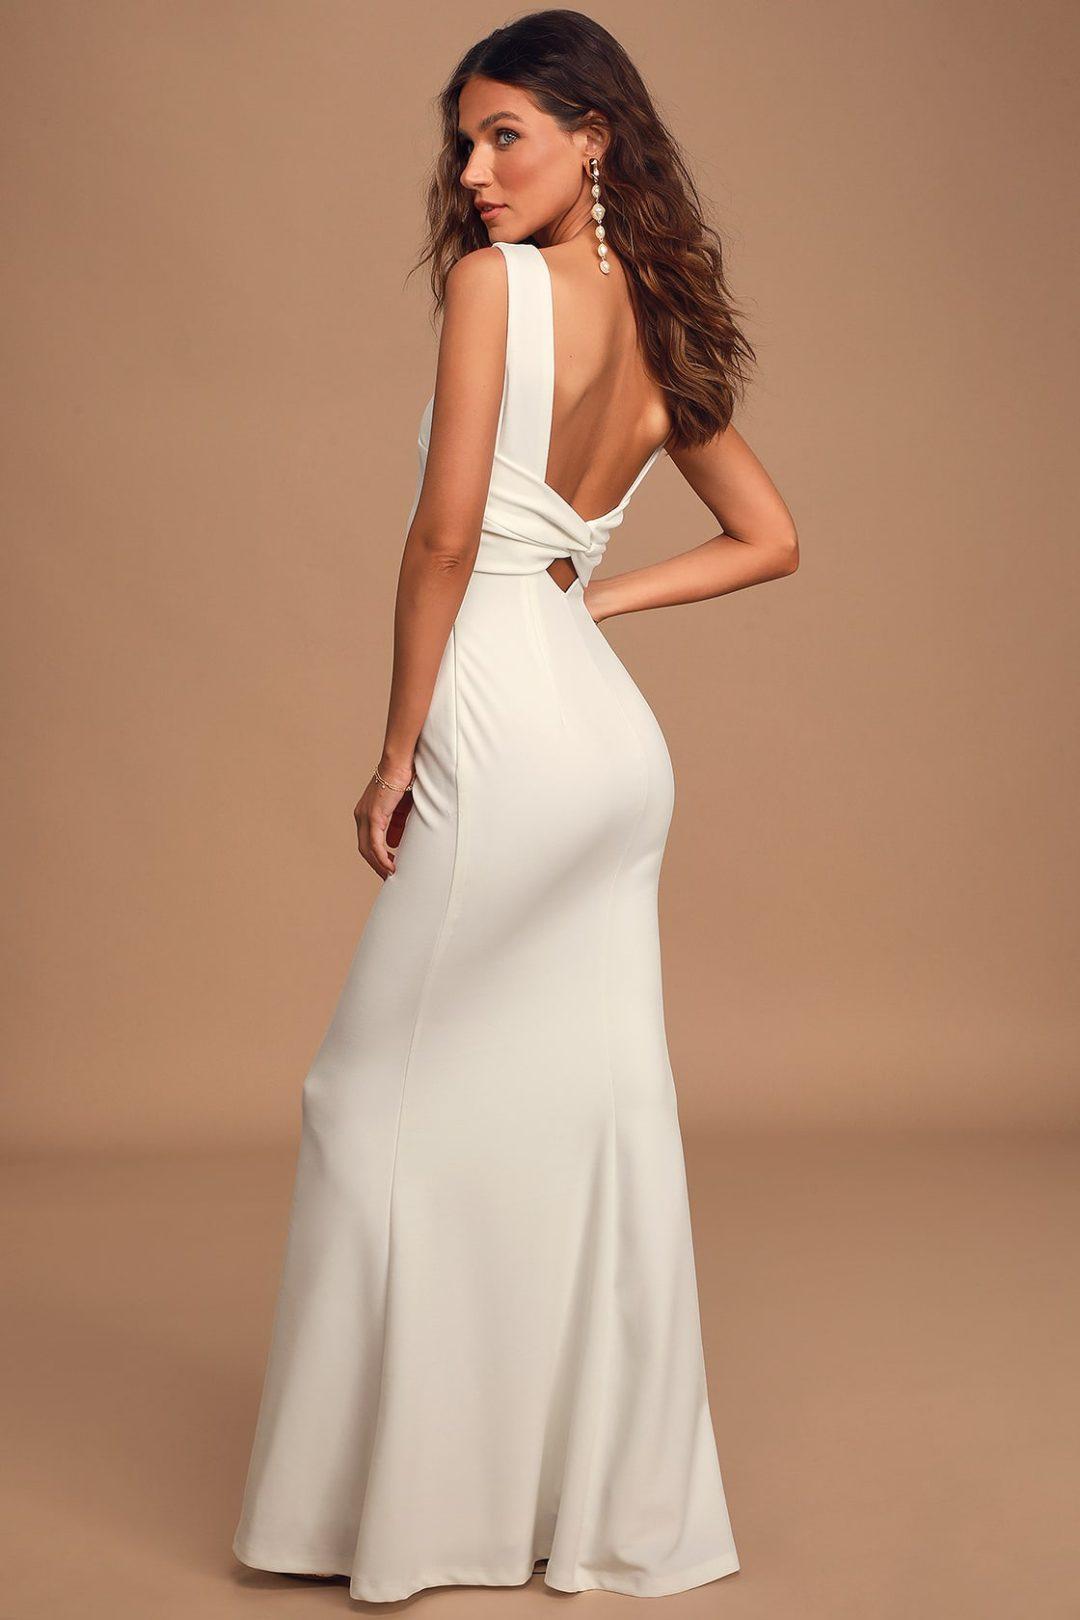 Affordable backless mermaid wedding dress under $100